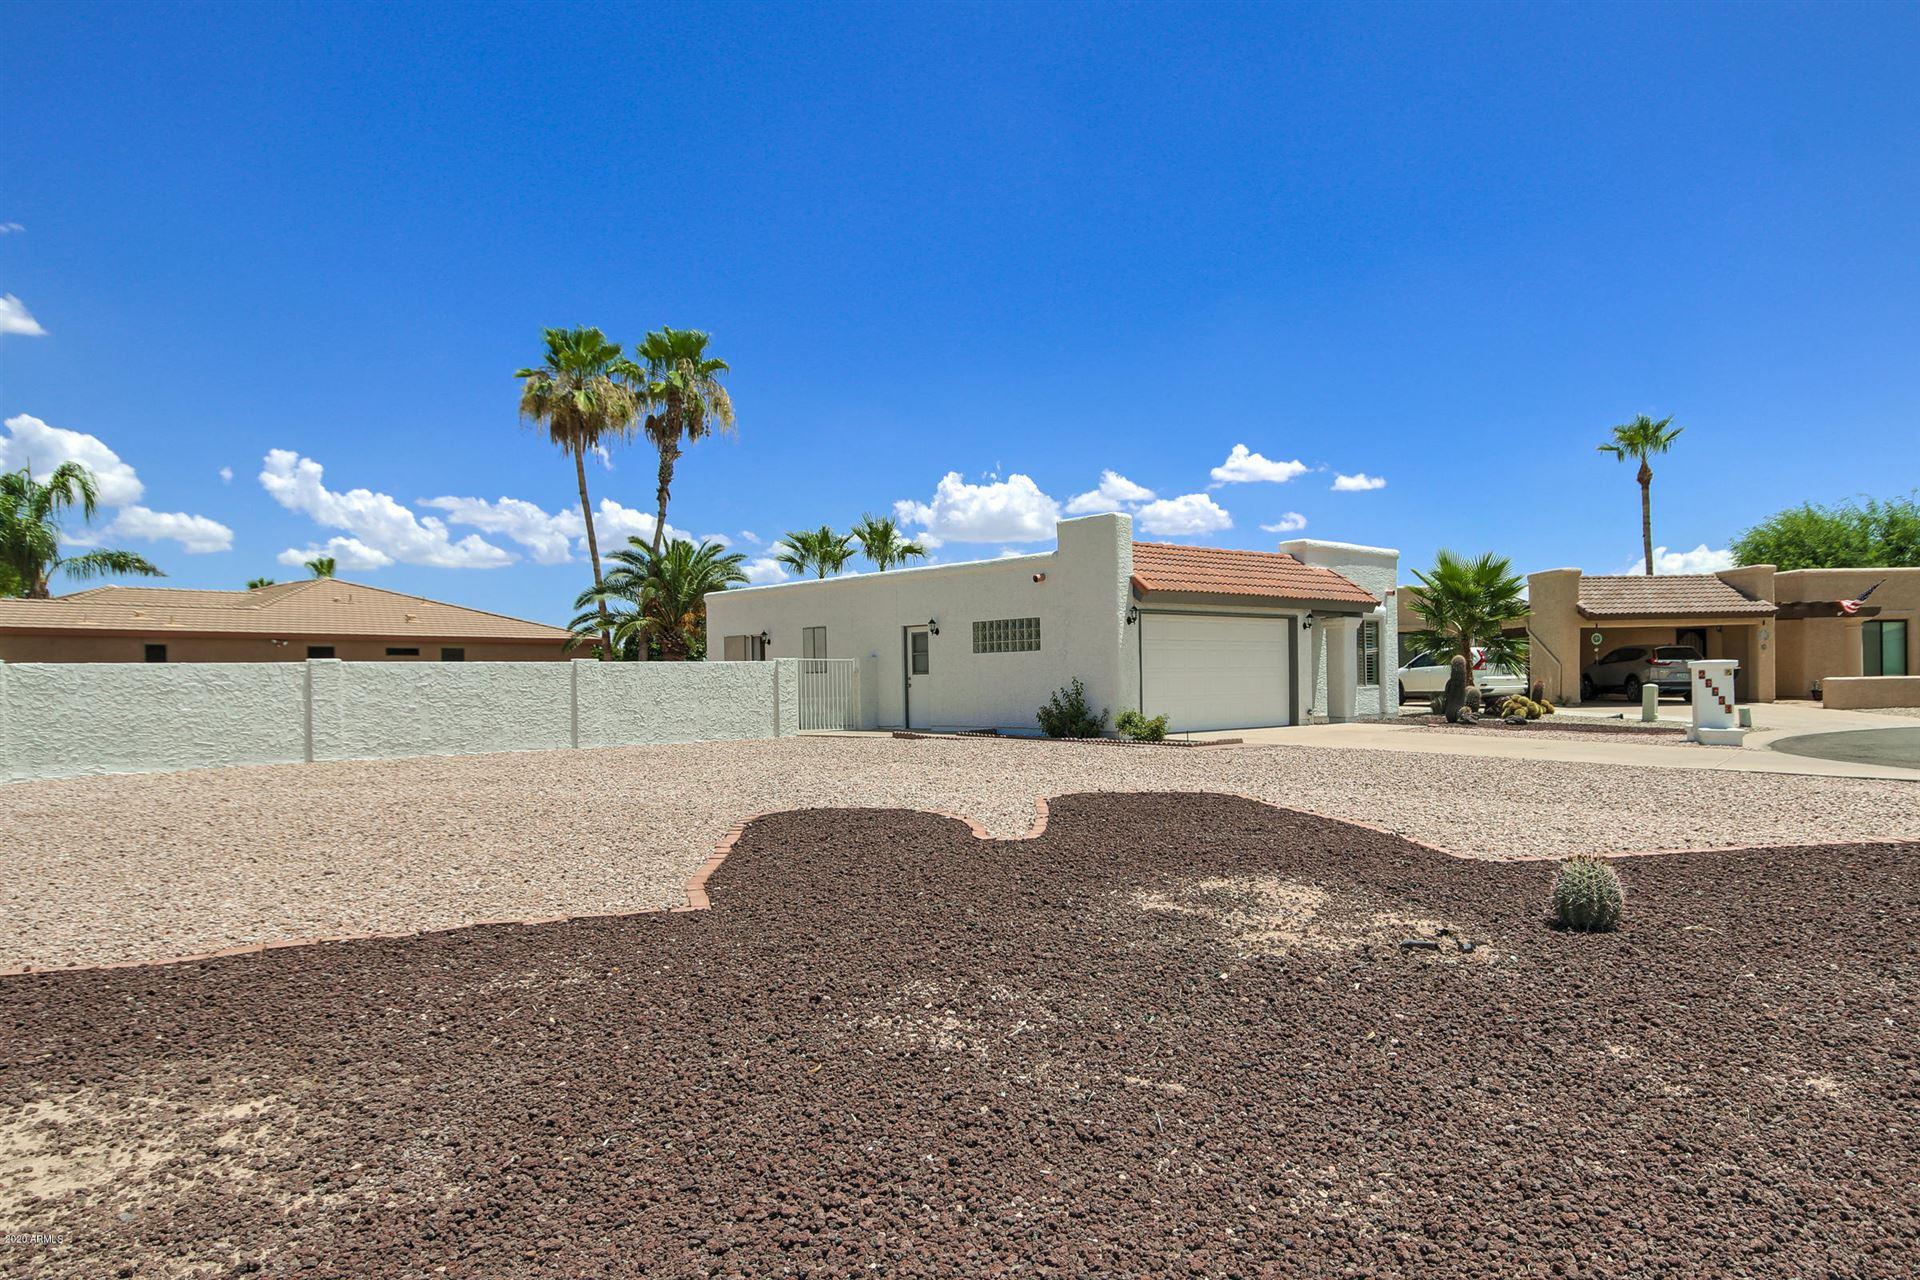 26631 S UNWIN Court, Sun Lakes, AZ 85248 - #: 6099256